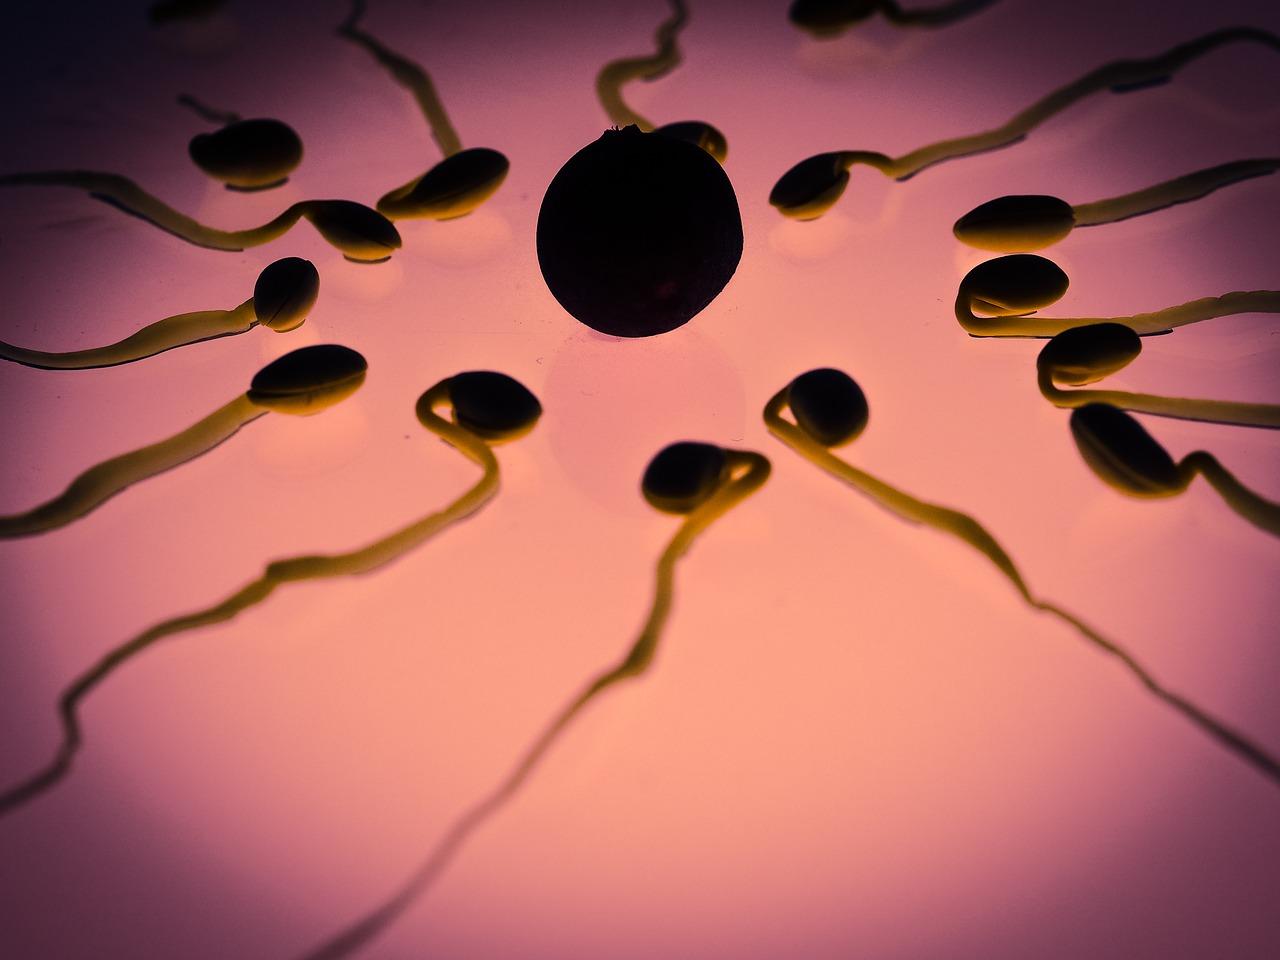 femeia la ovulatie - sfatulparintilor.ro - pixabay_com